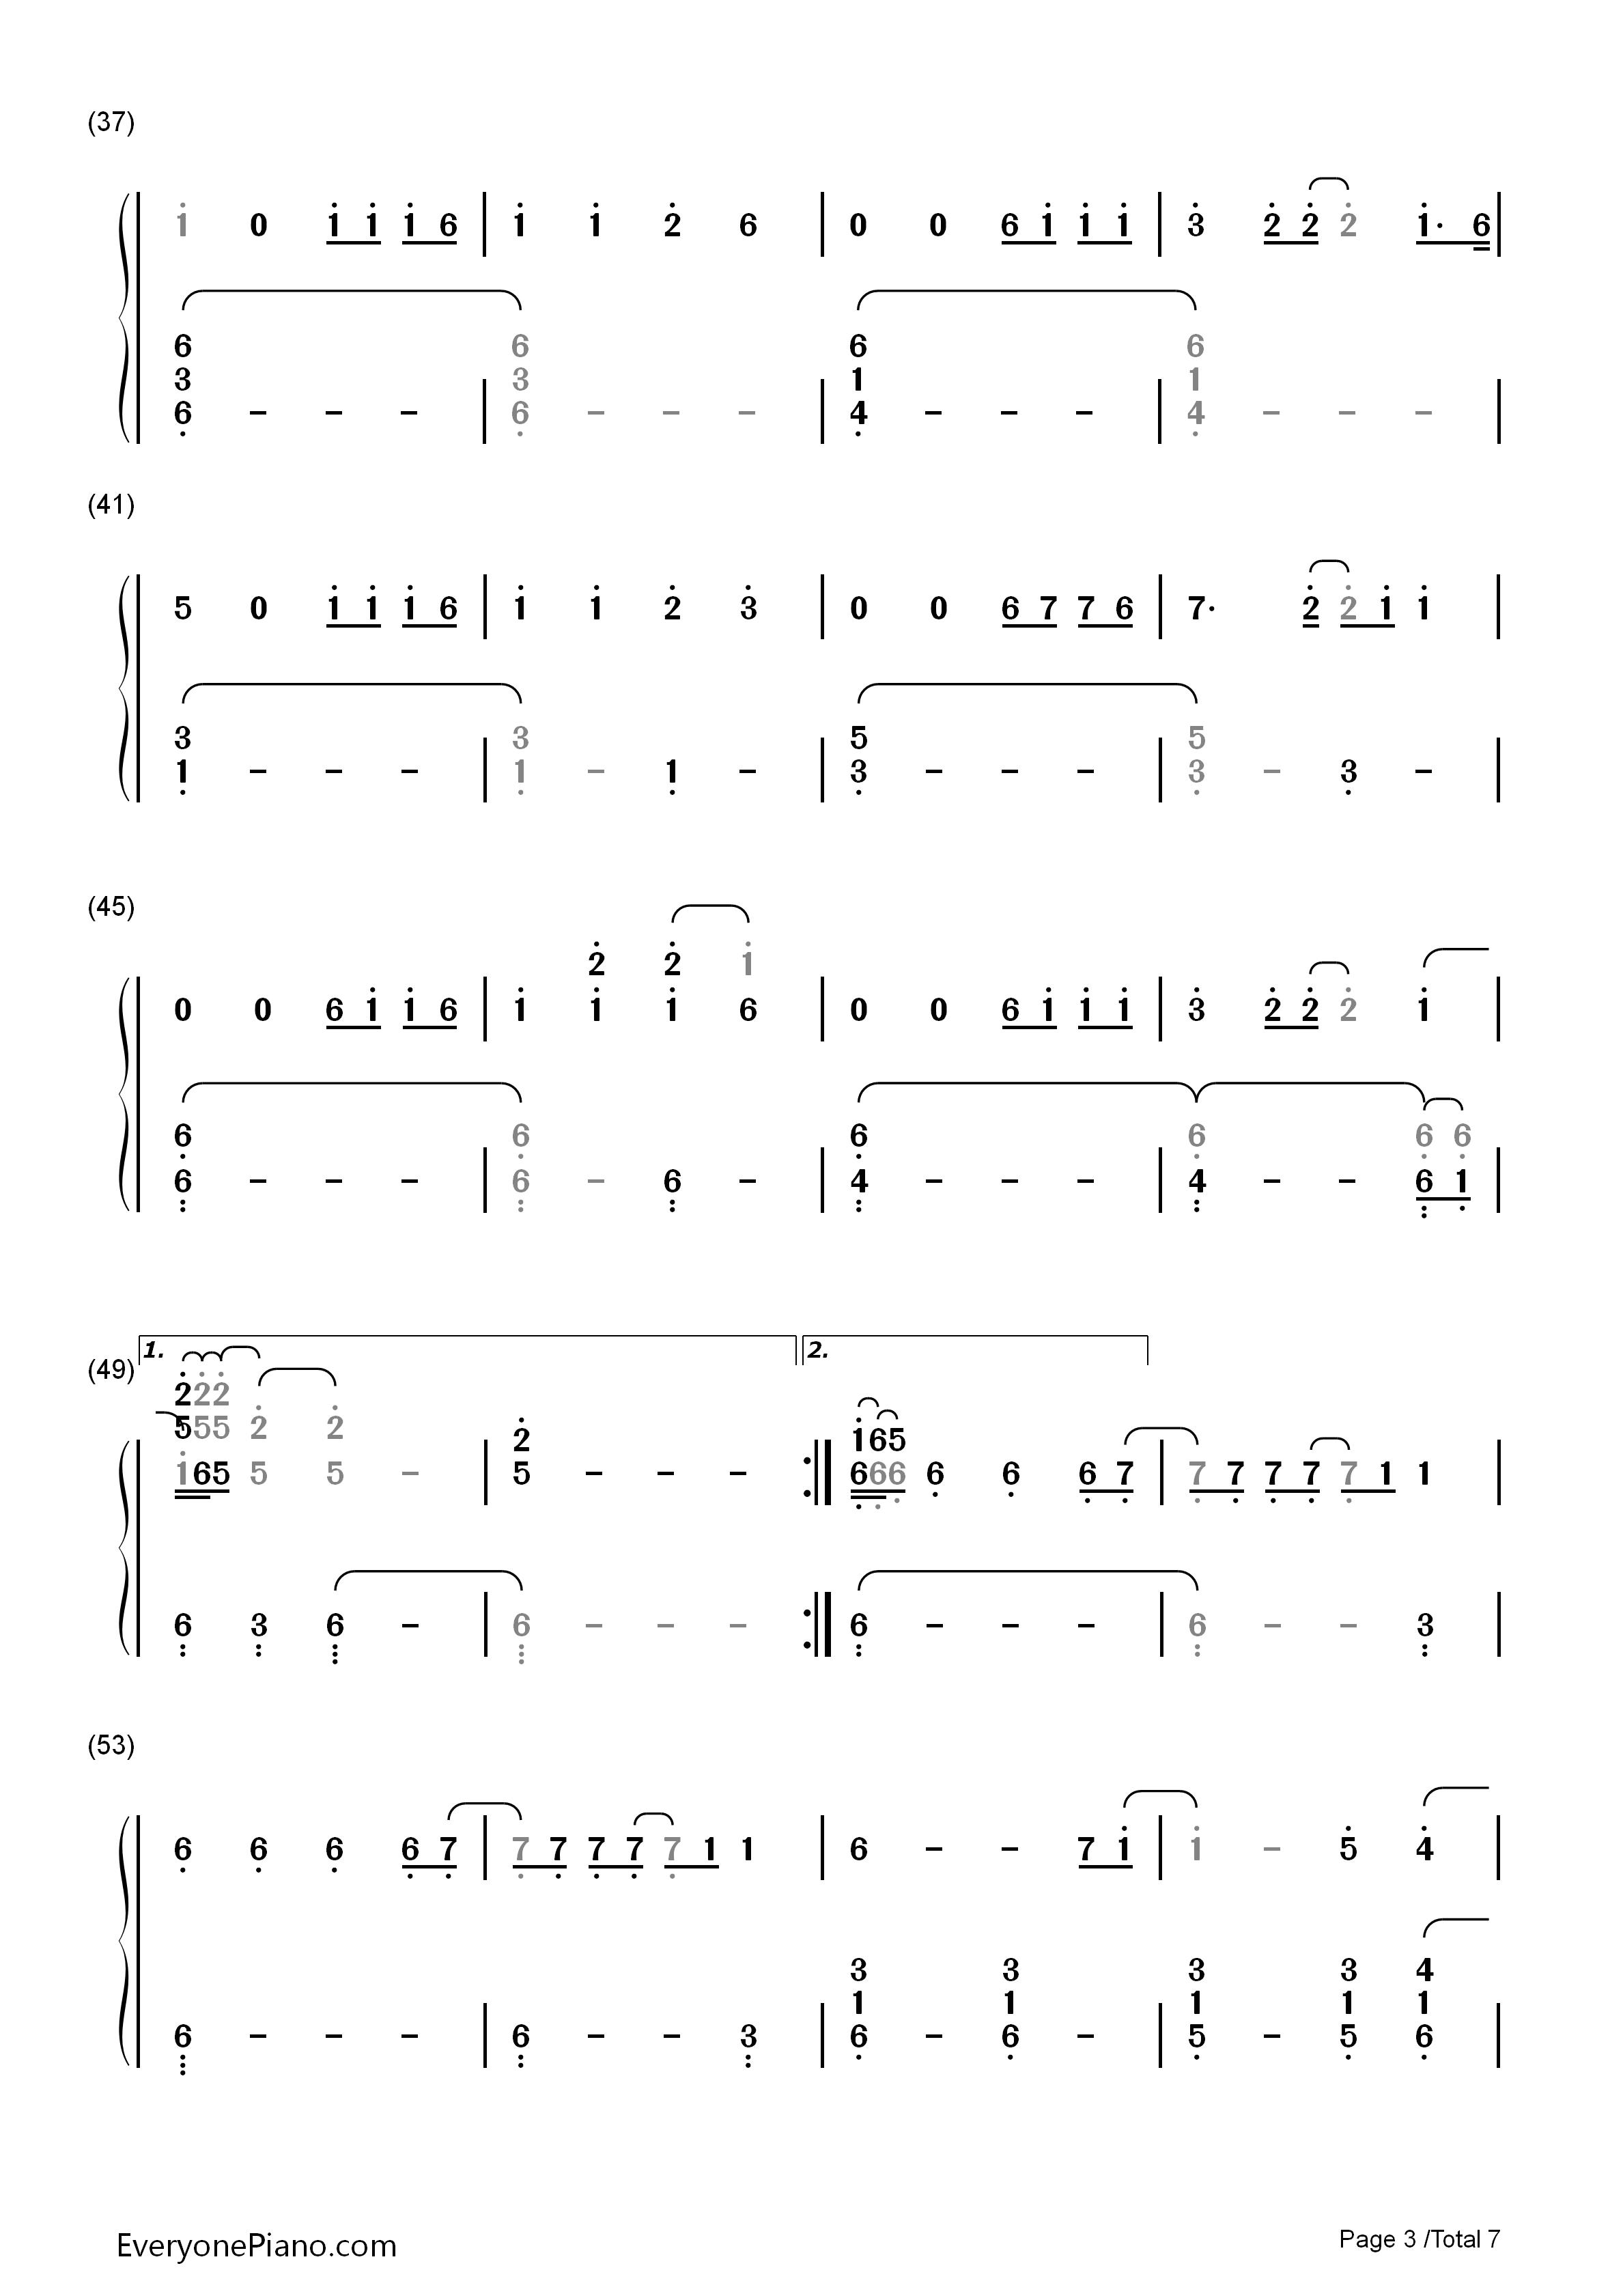 Hunt双手简谱预览3 钢琴谱文件 五线谱 双手简谱 数字谱 Midi PDF